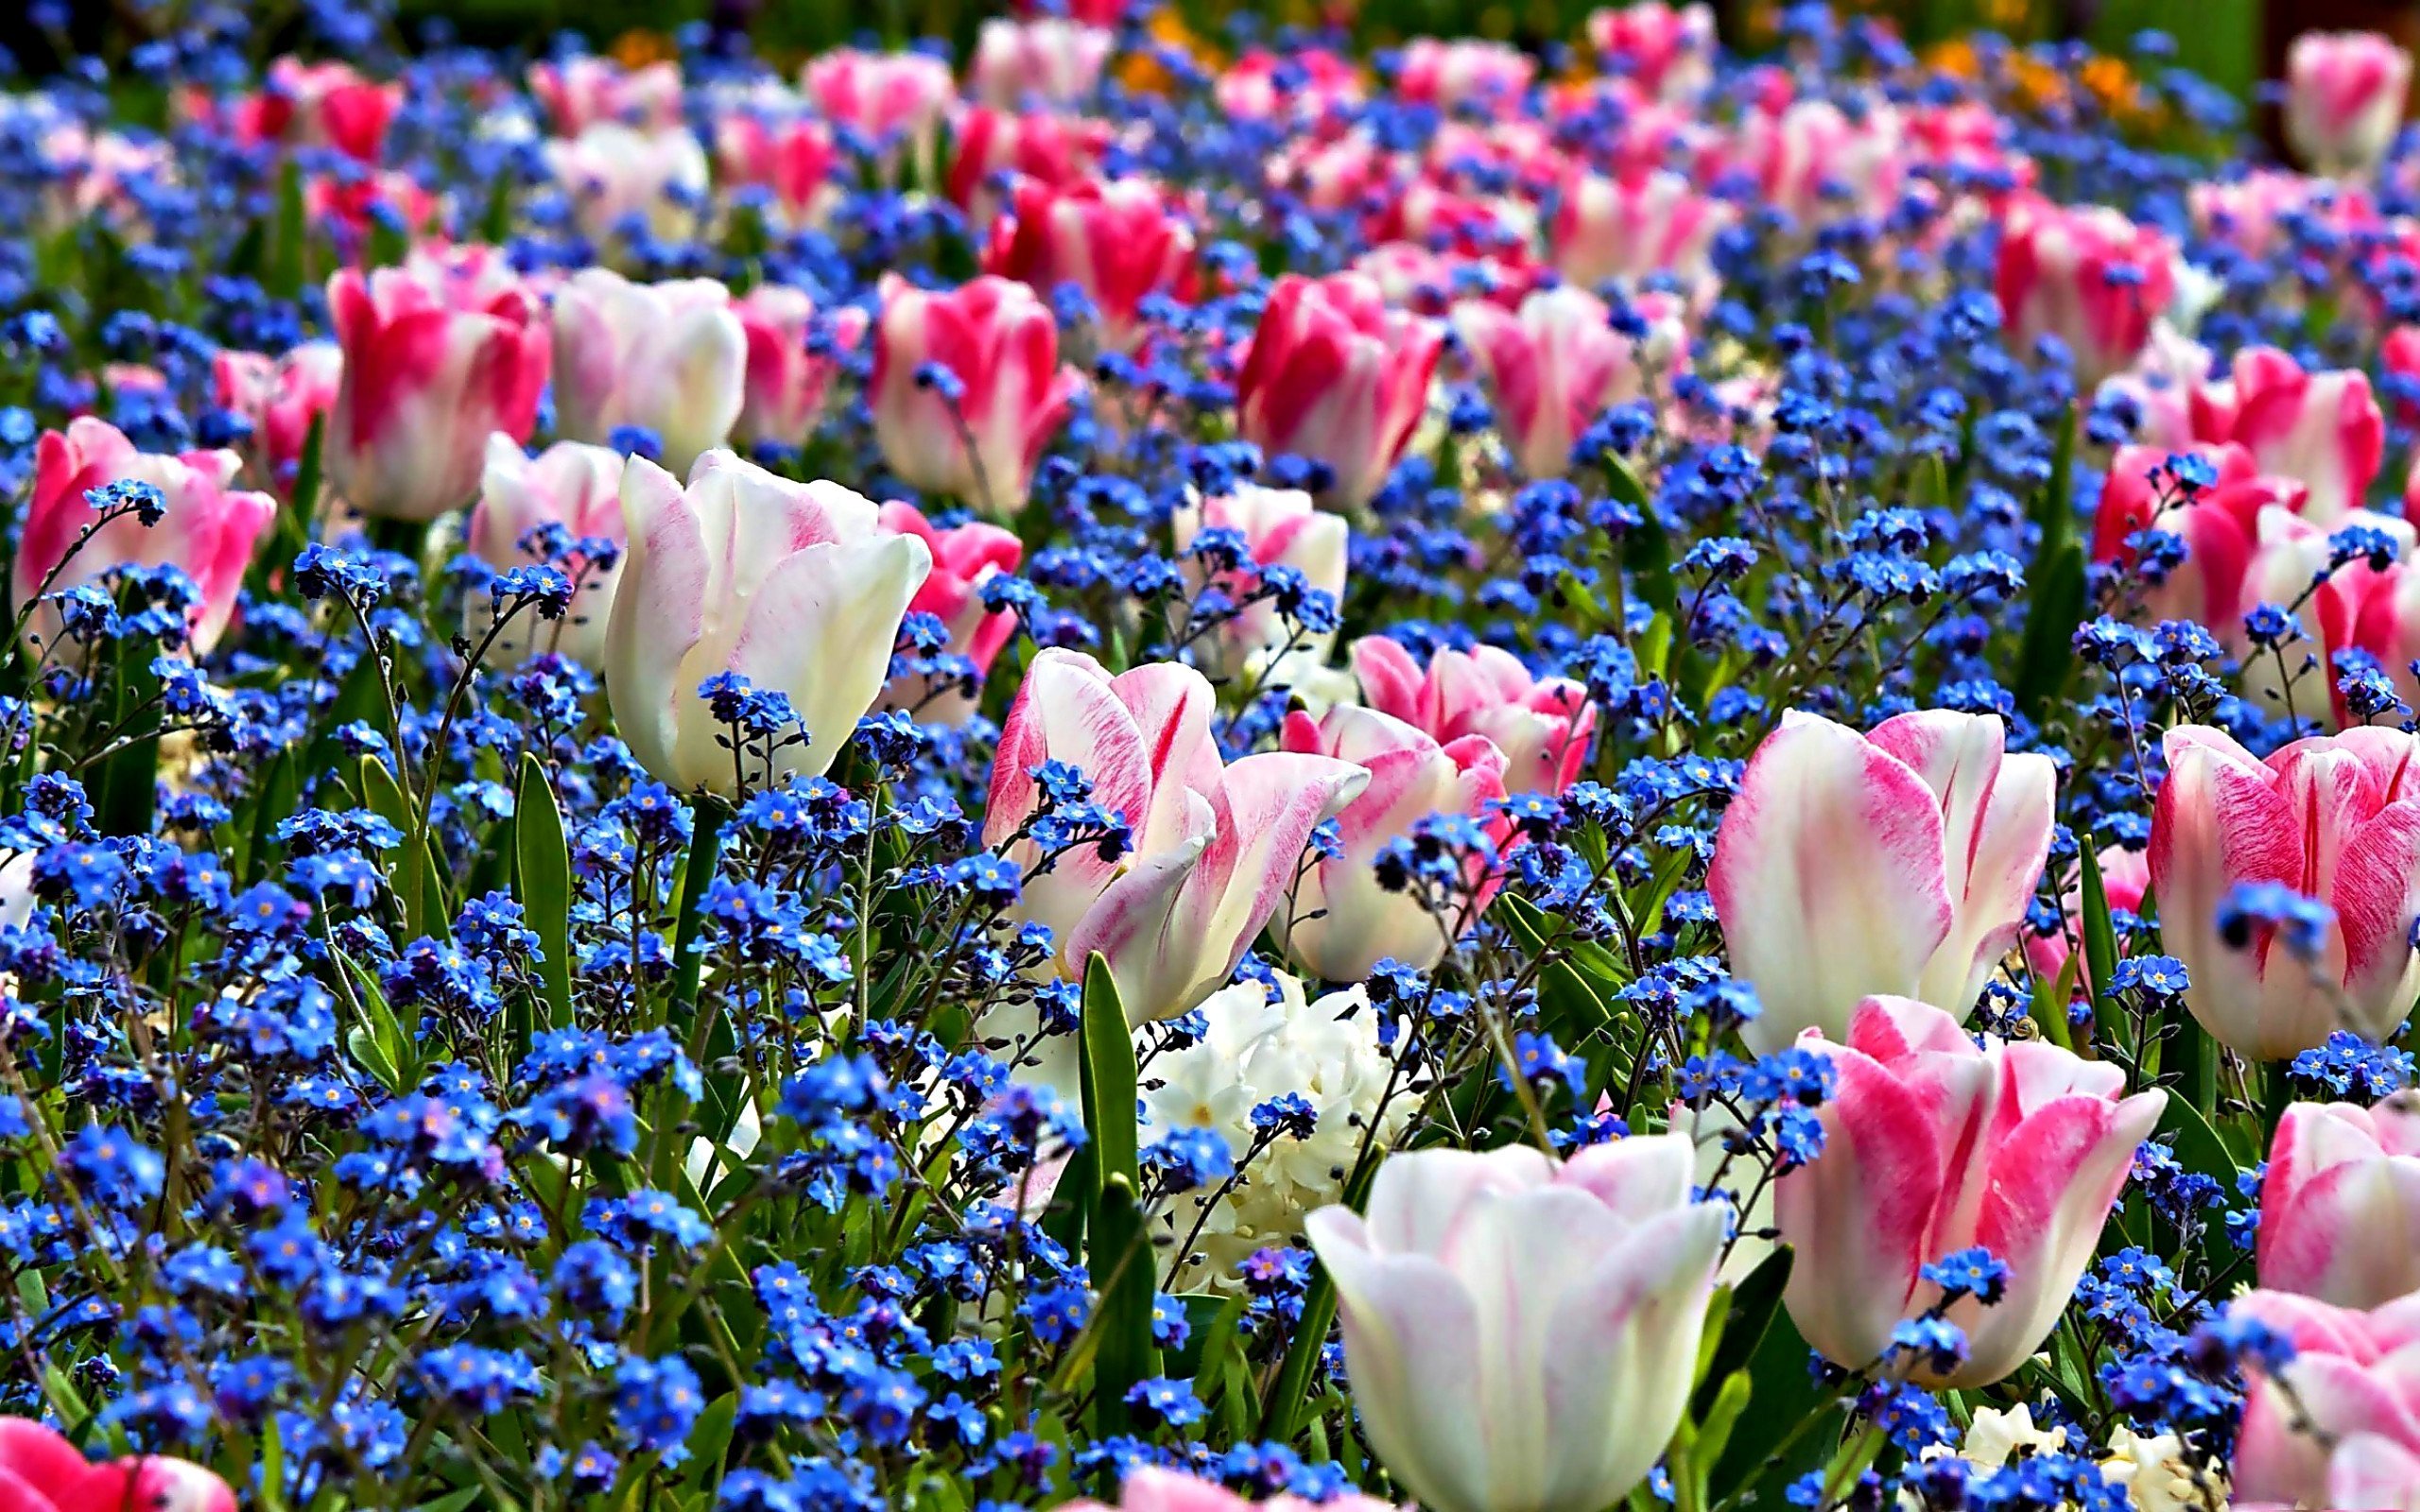 Spring flowers background desktop 66 pictures 2560x1600 2560x1600 beautiful pink spring flowers wallpaper desktop background free mightylinksfo